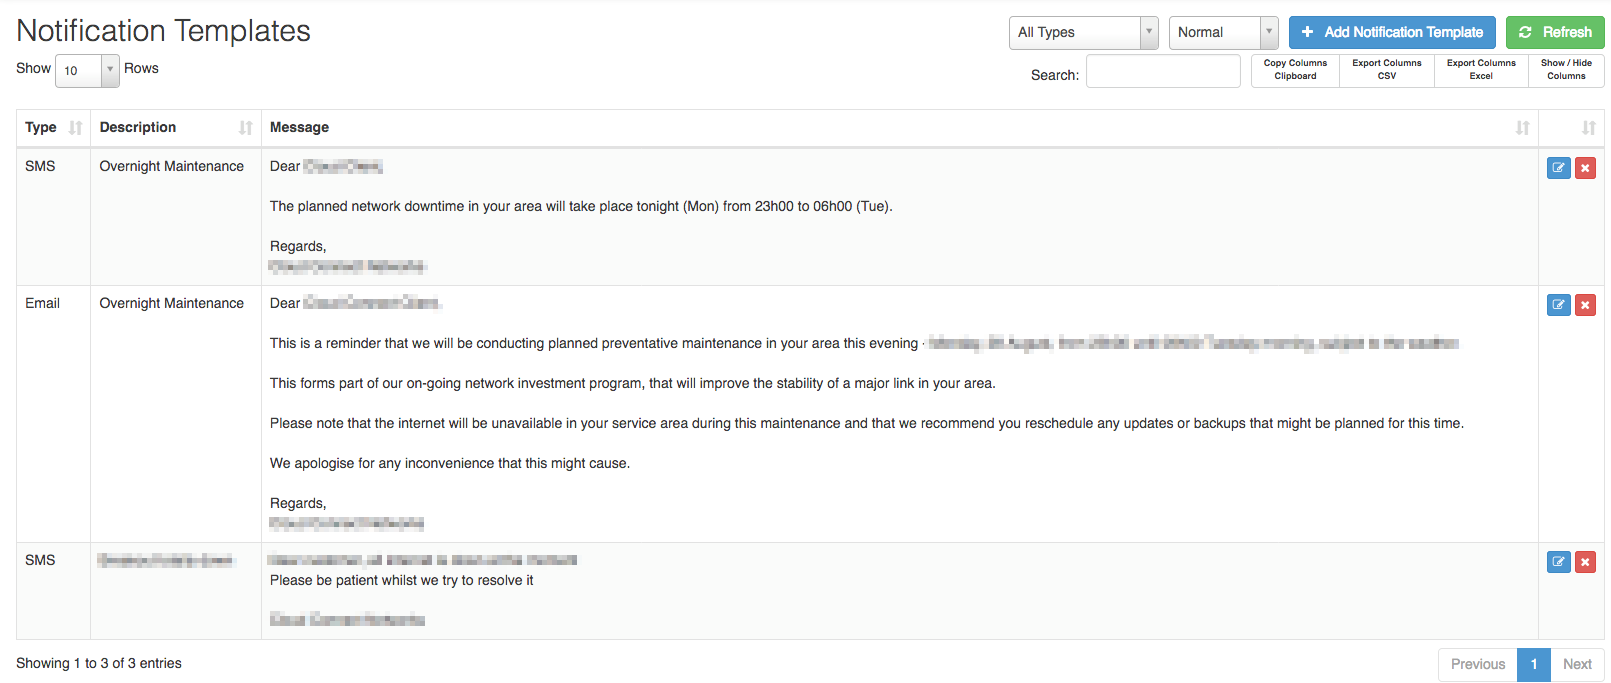 notification template screen